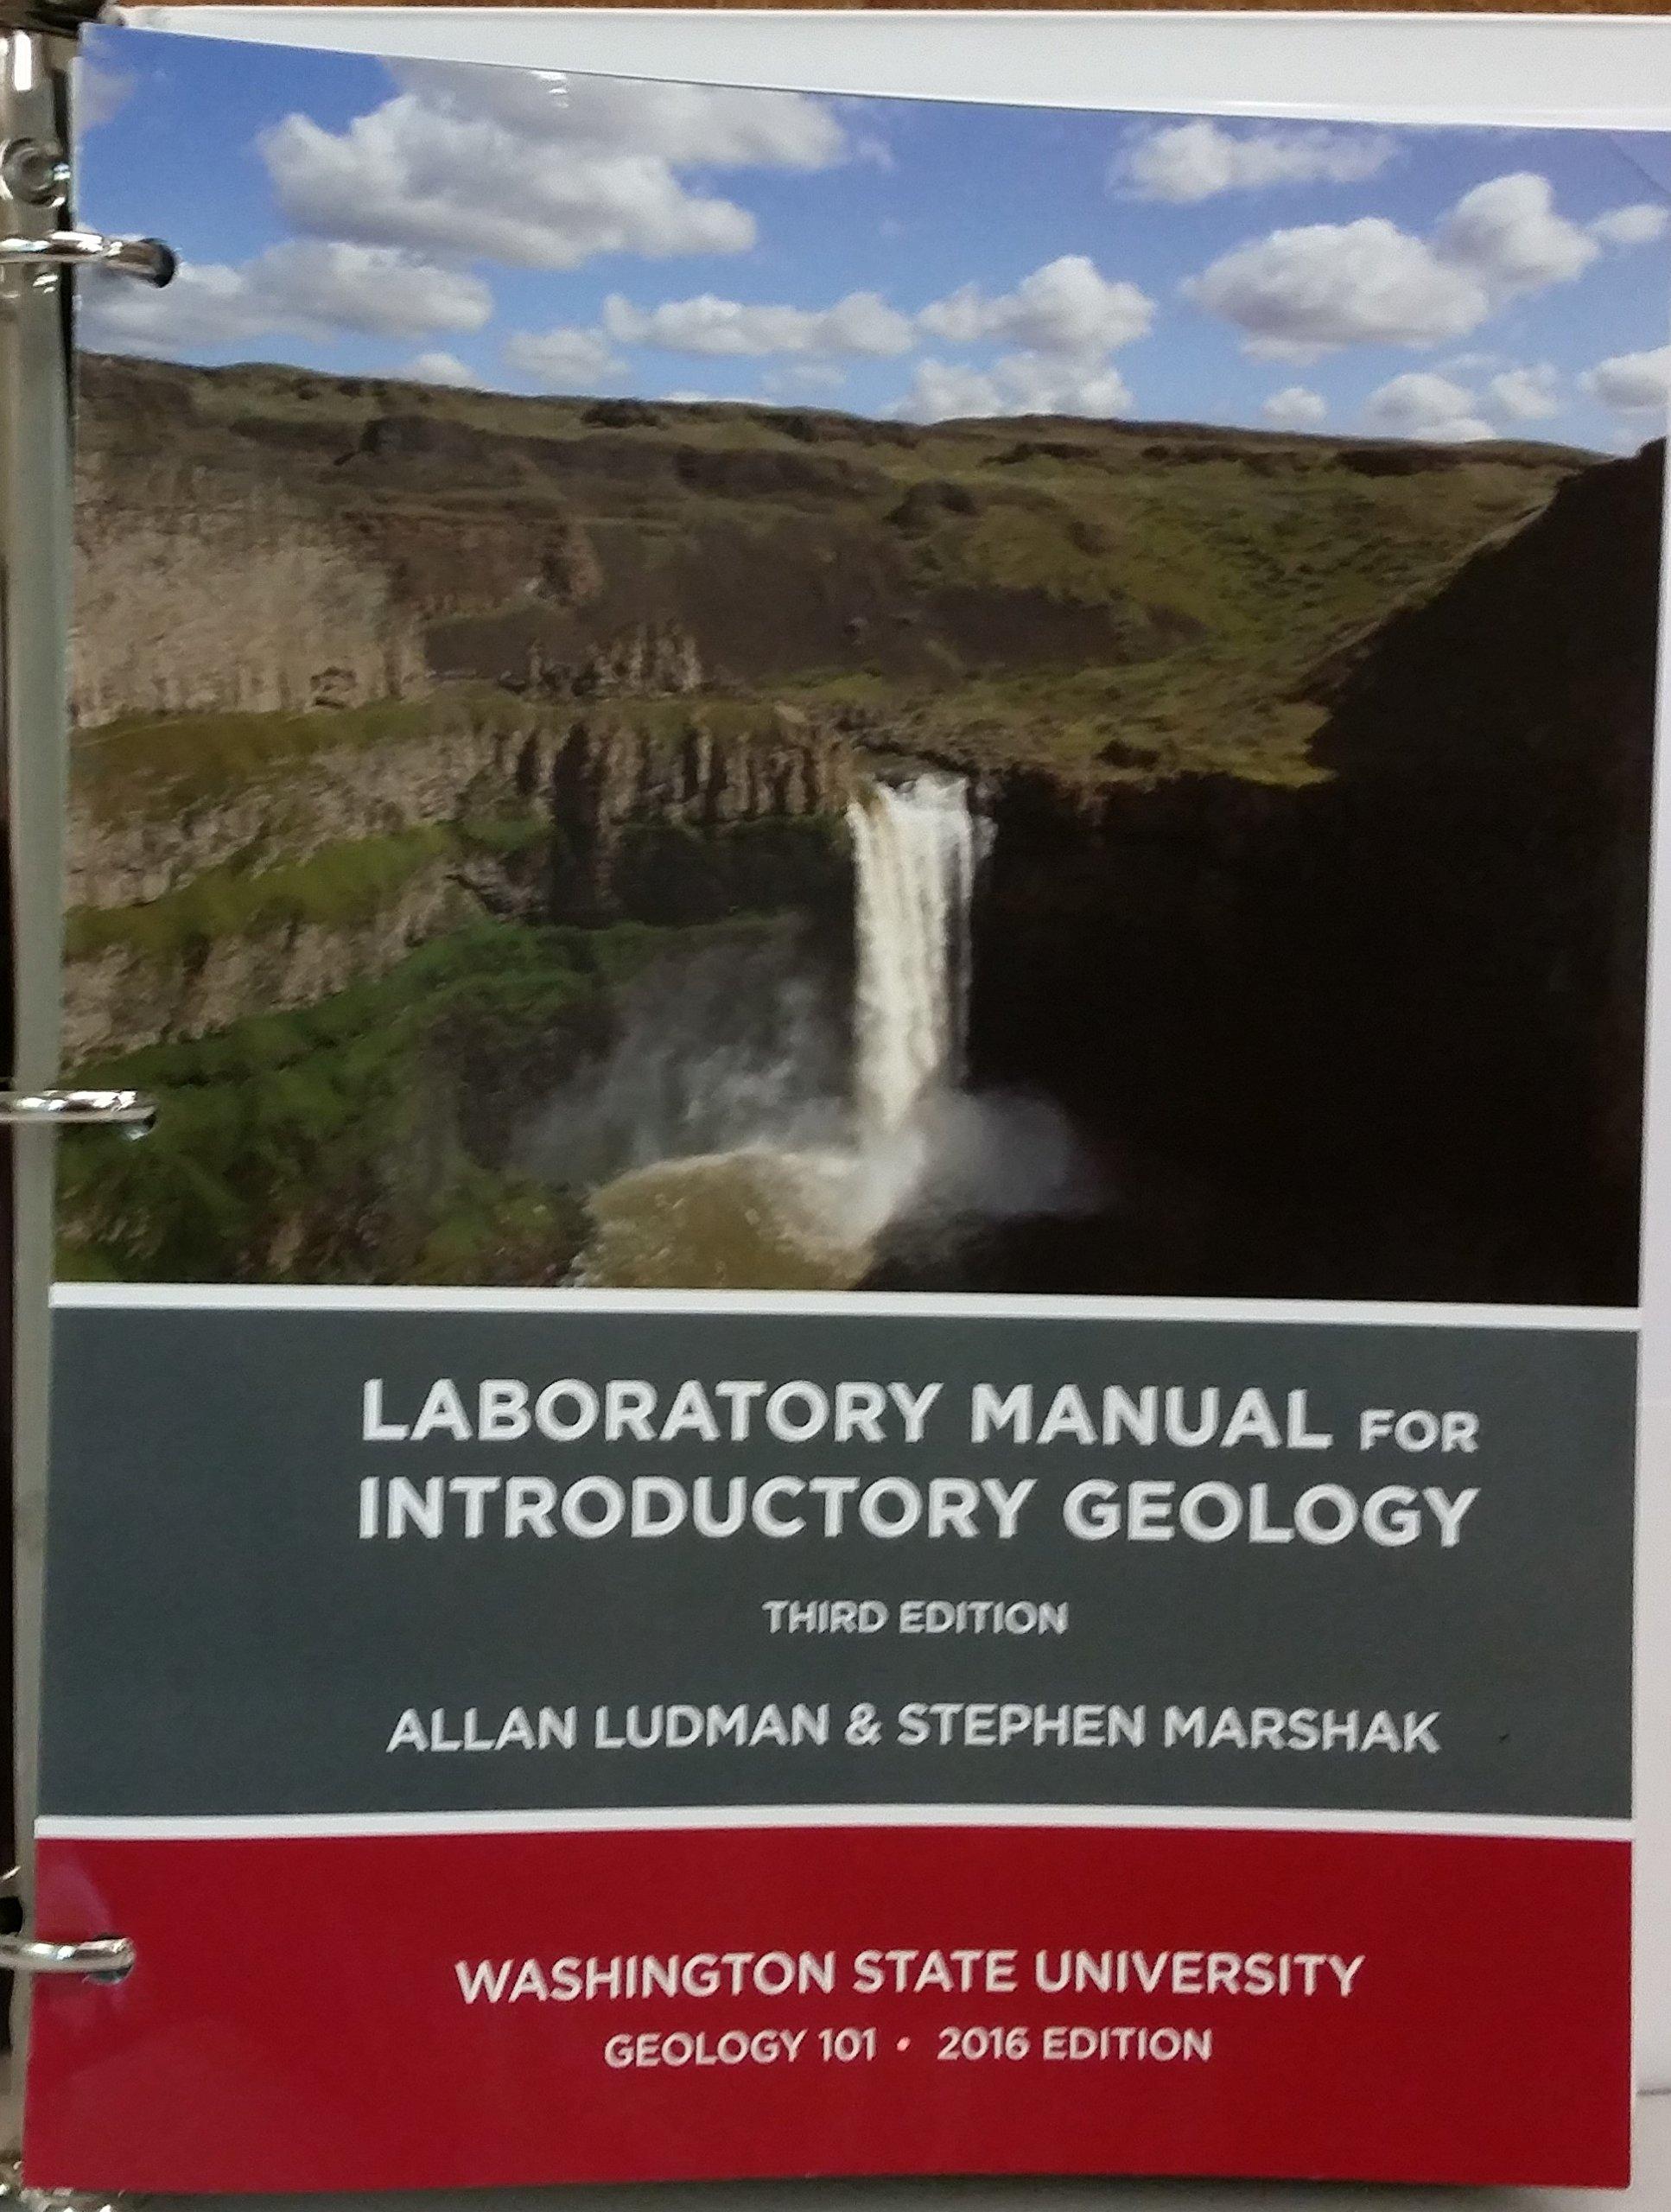 Loose Leaf 2016 Laboratory Manual for Introductory Geology 3rd Custom  Edition for WSU: Allan Ludman, Stephen Marshak: 9780393601138: Amazon.com:  Books